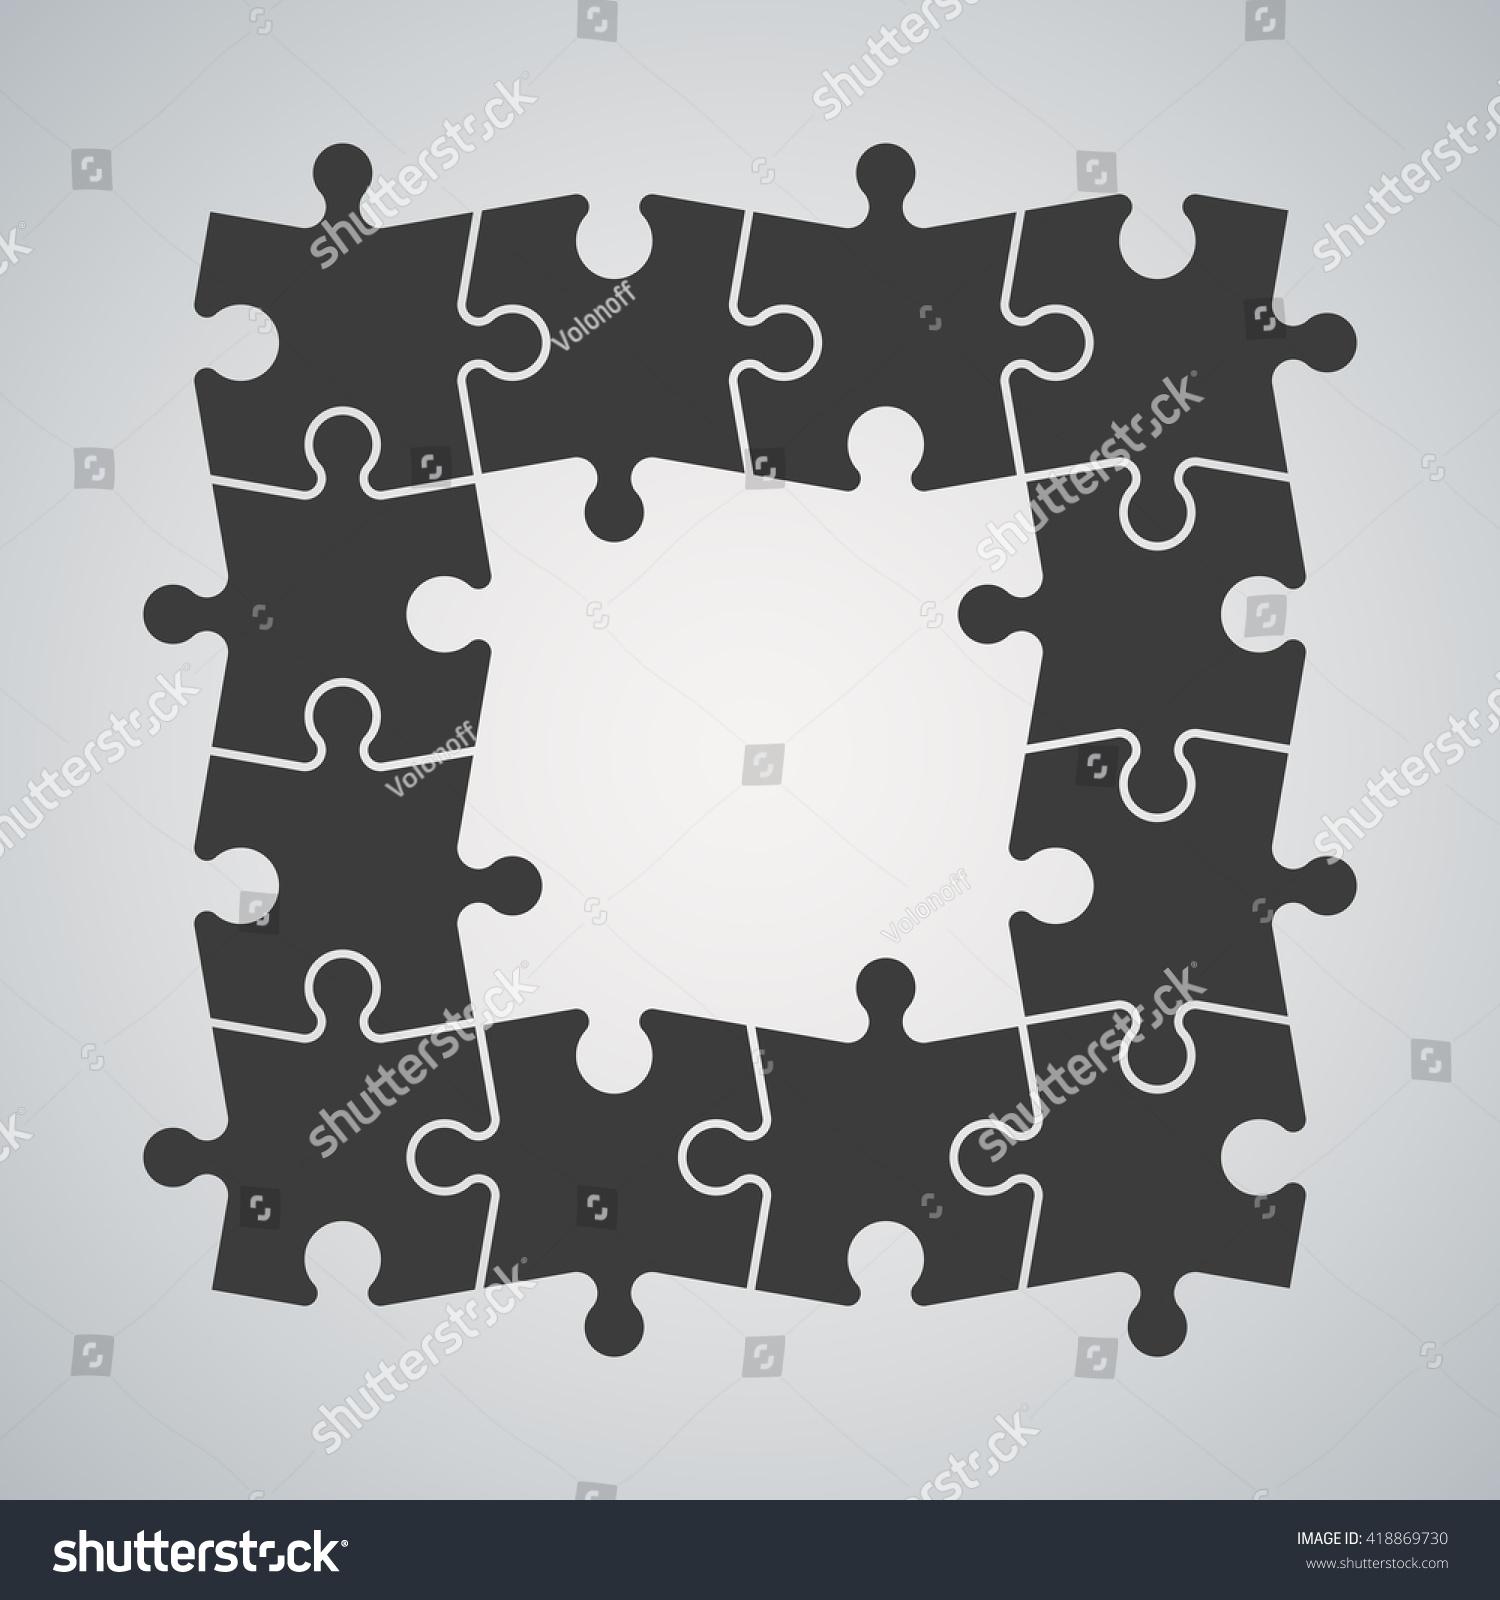 Ten Piece Flat Puzzle Round Infographic Stock Vector 418869730 ...